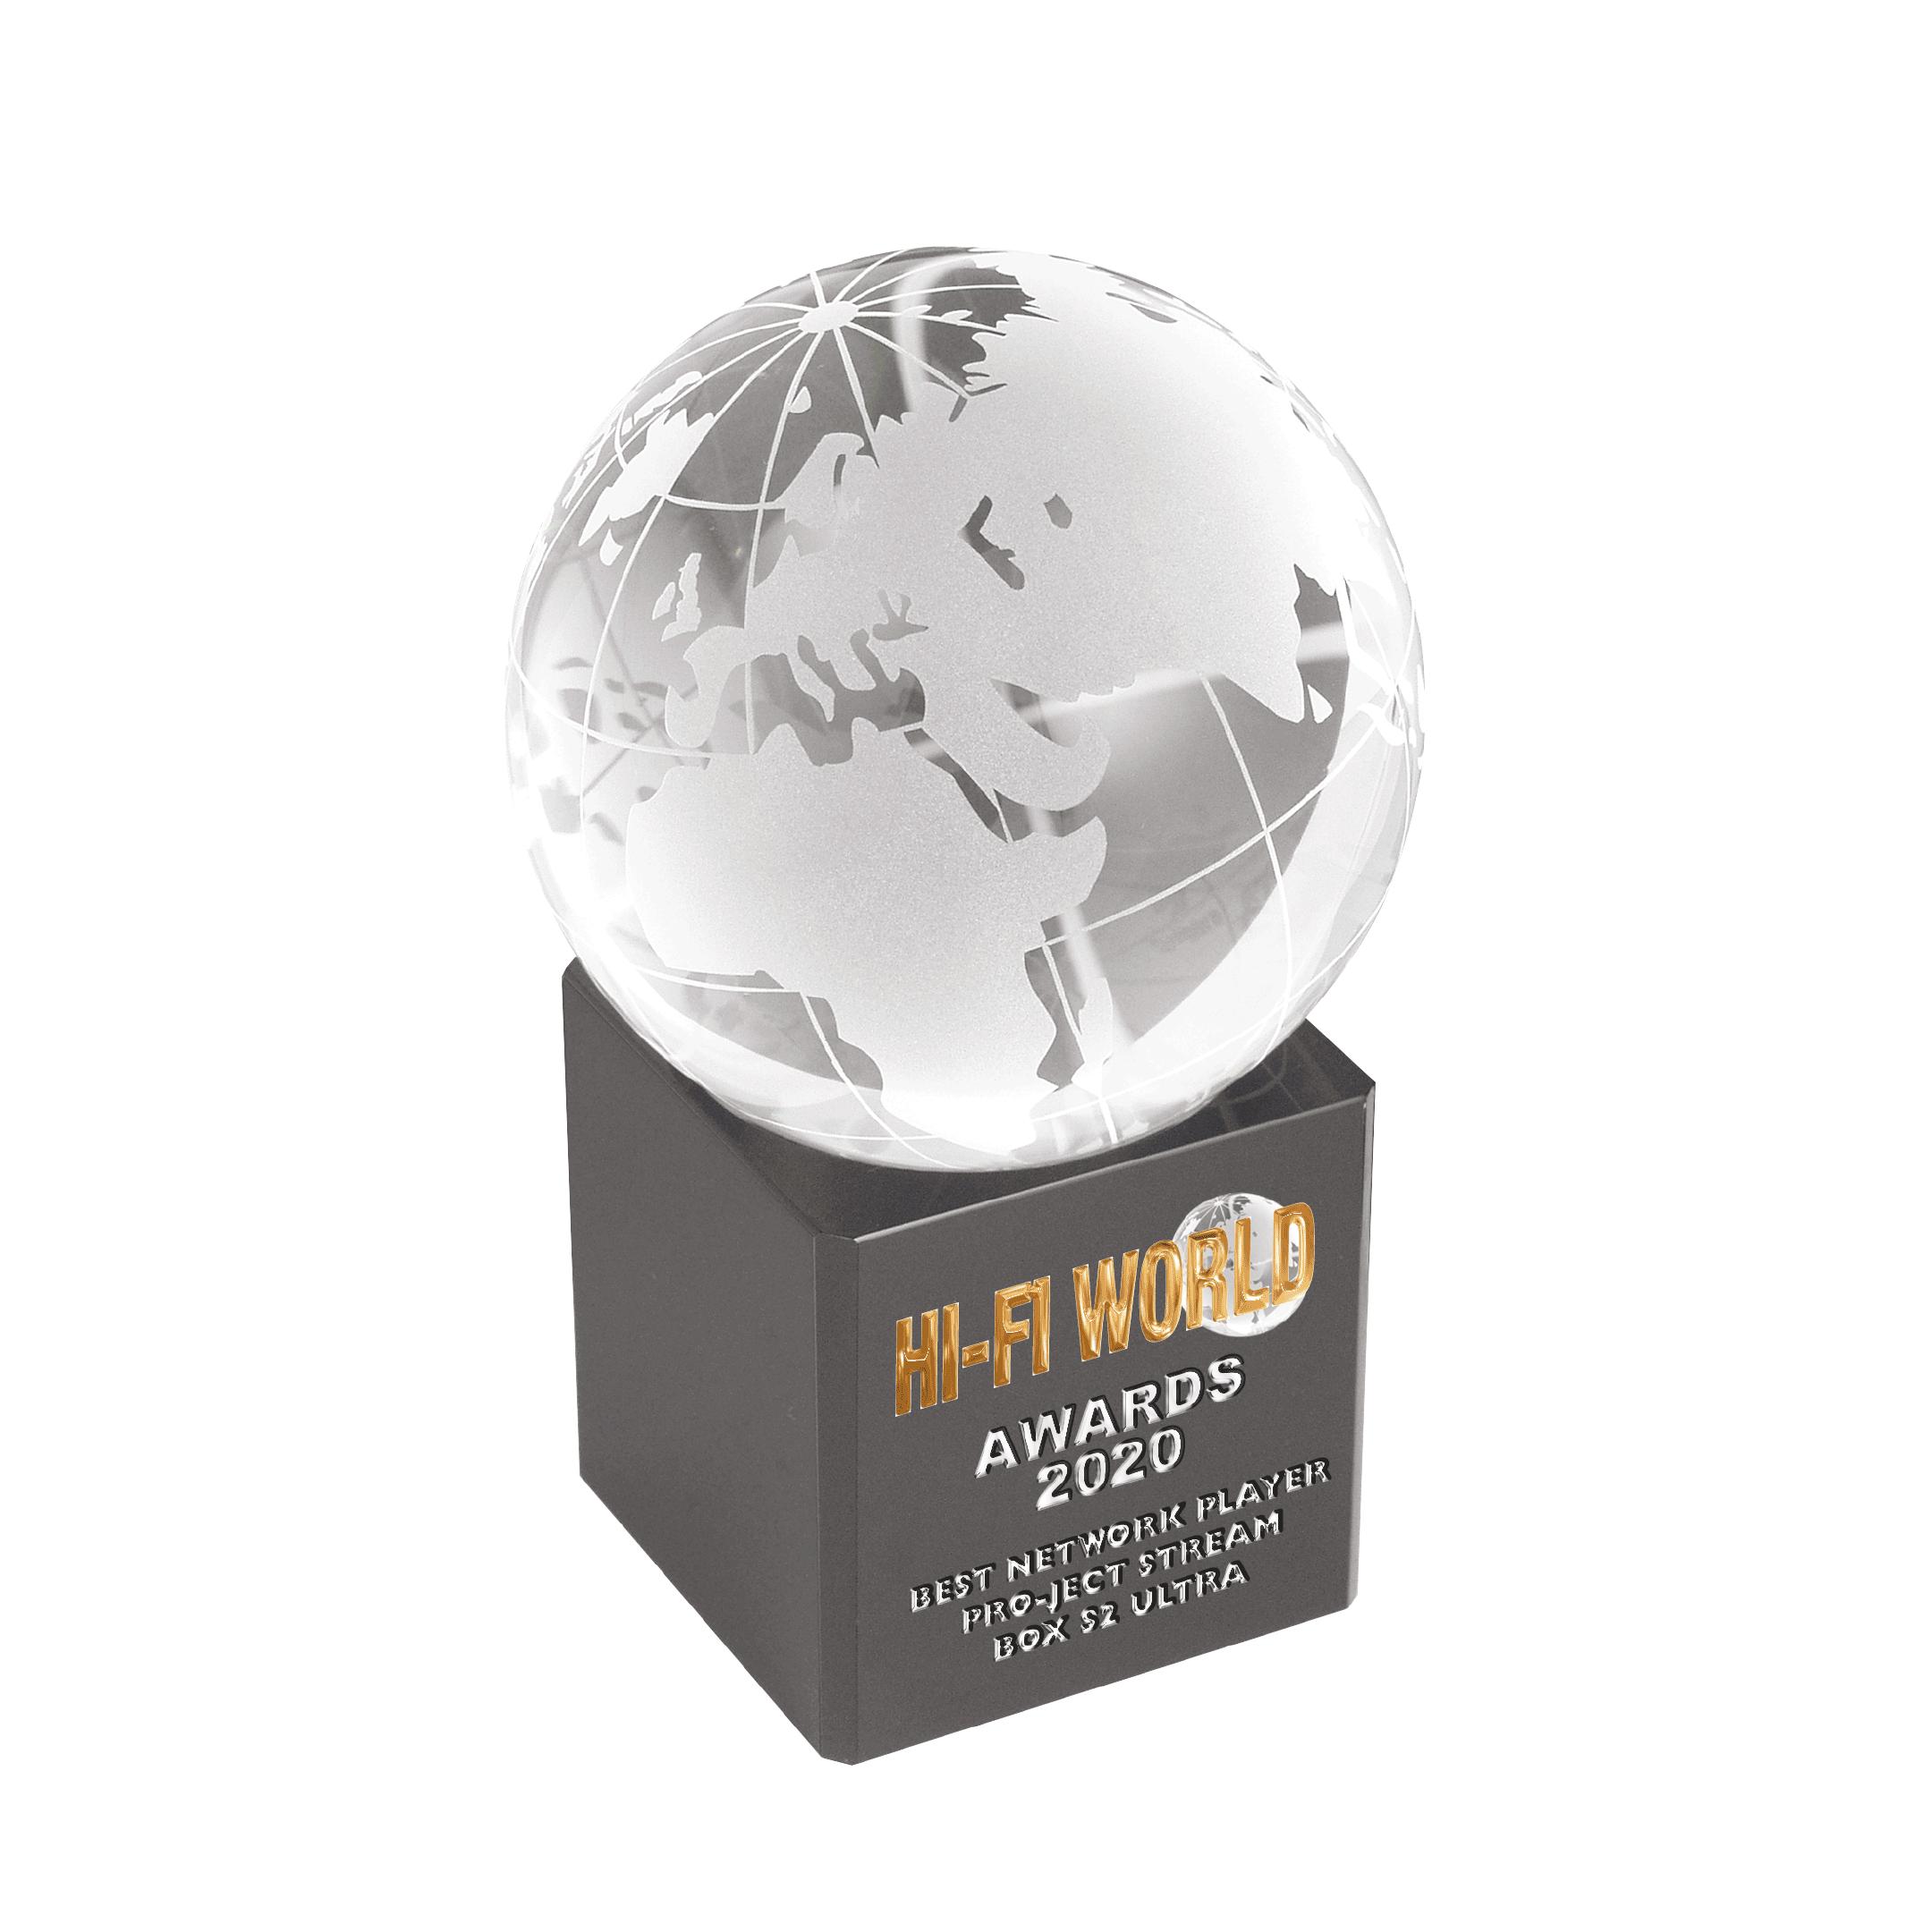 Pro-Ject, Stream Box S2 Ultra, HiFi World Award, 2020